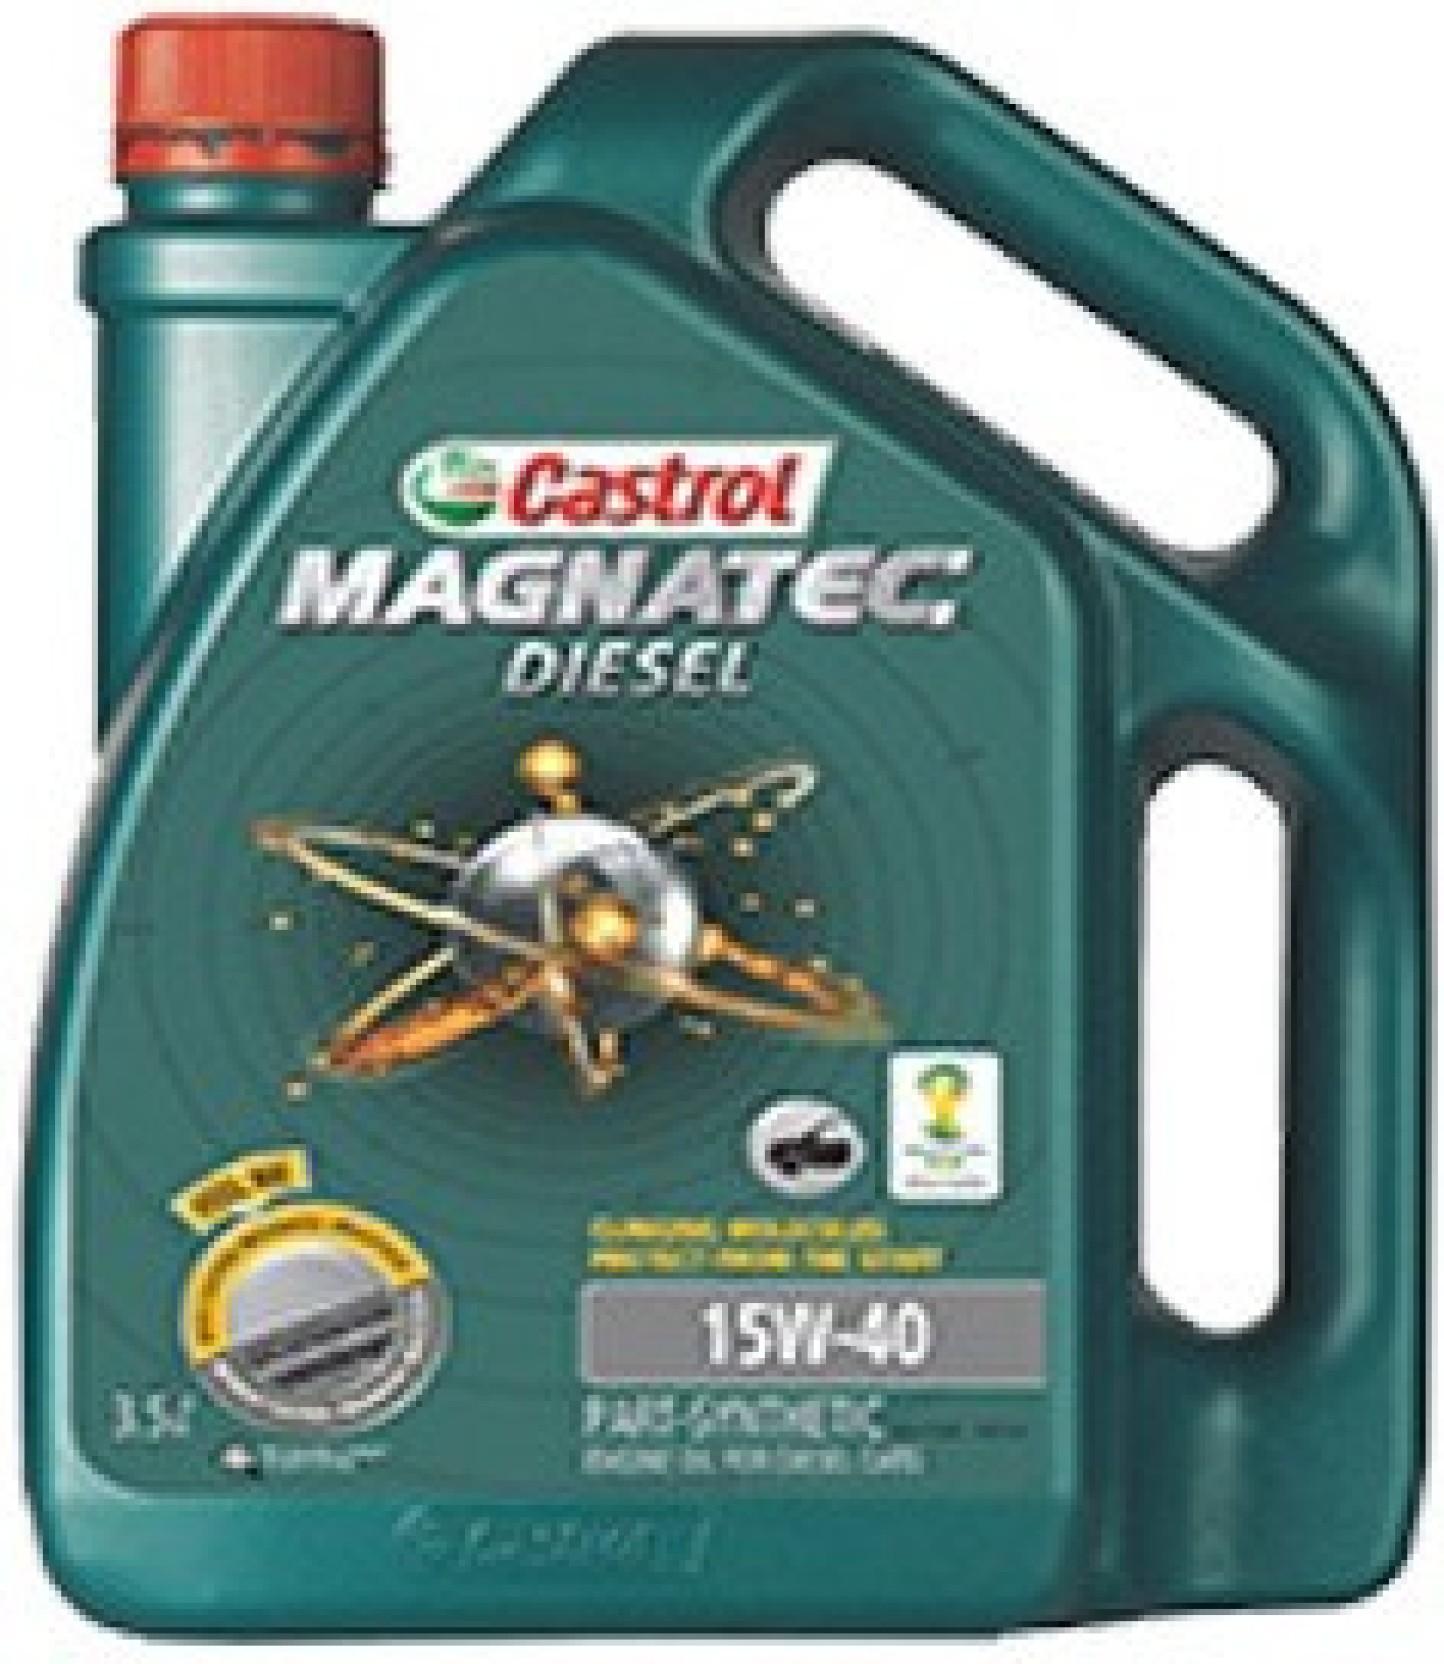 Castrol 15w 40 magnatec diesel engine oil price in india for Buy motor oil online